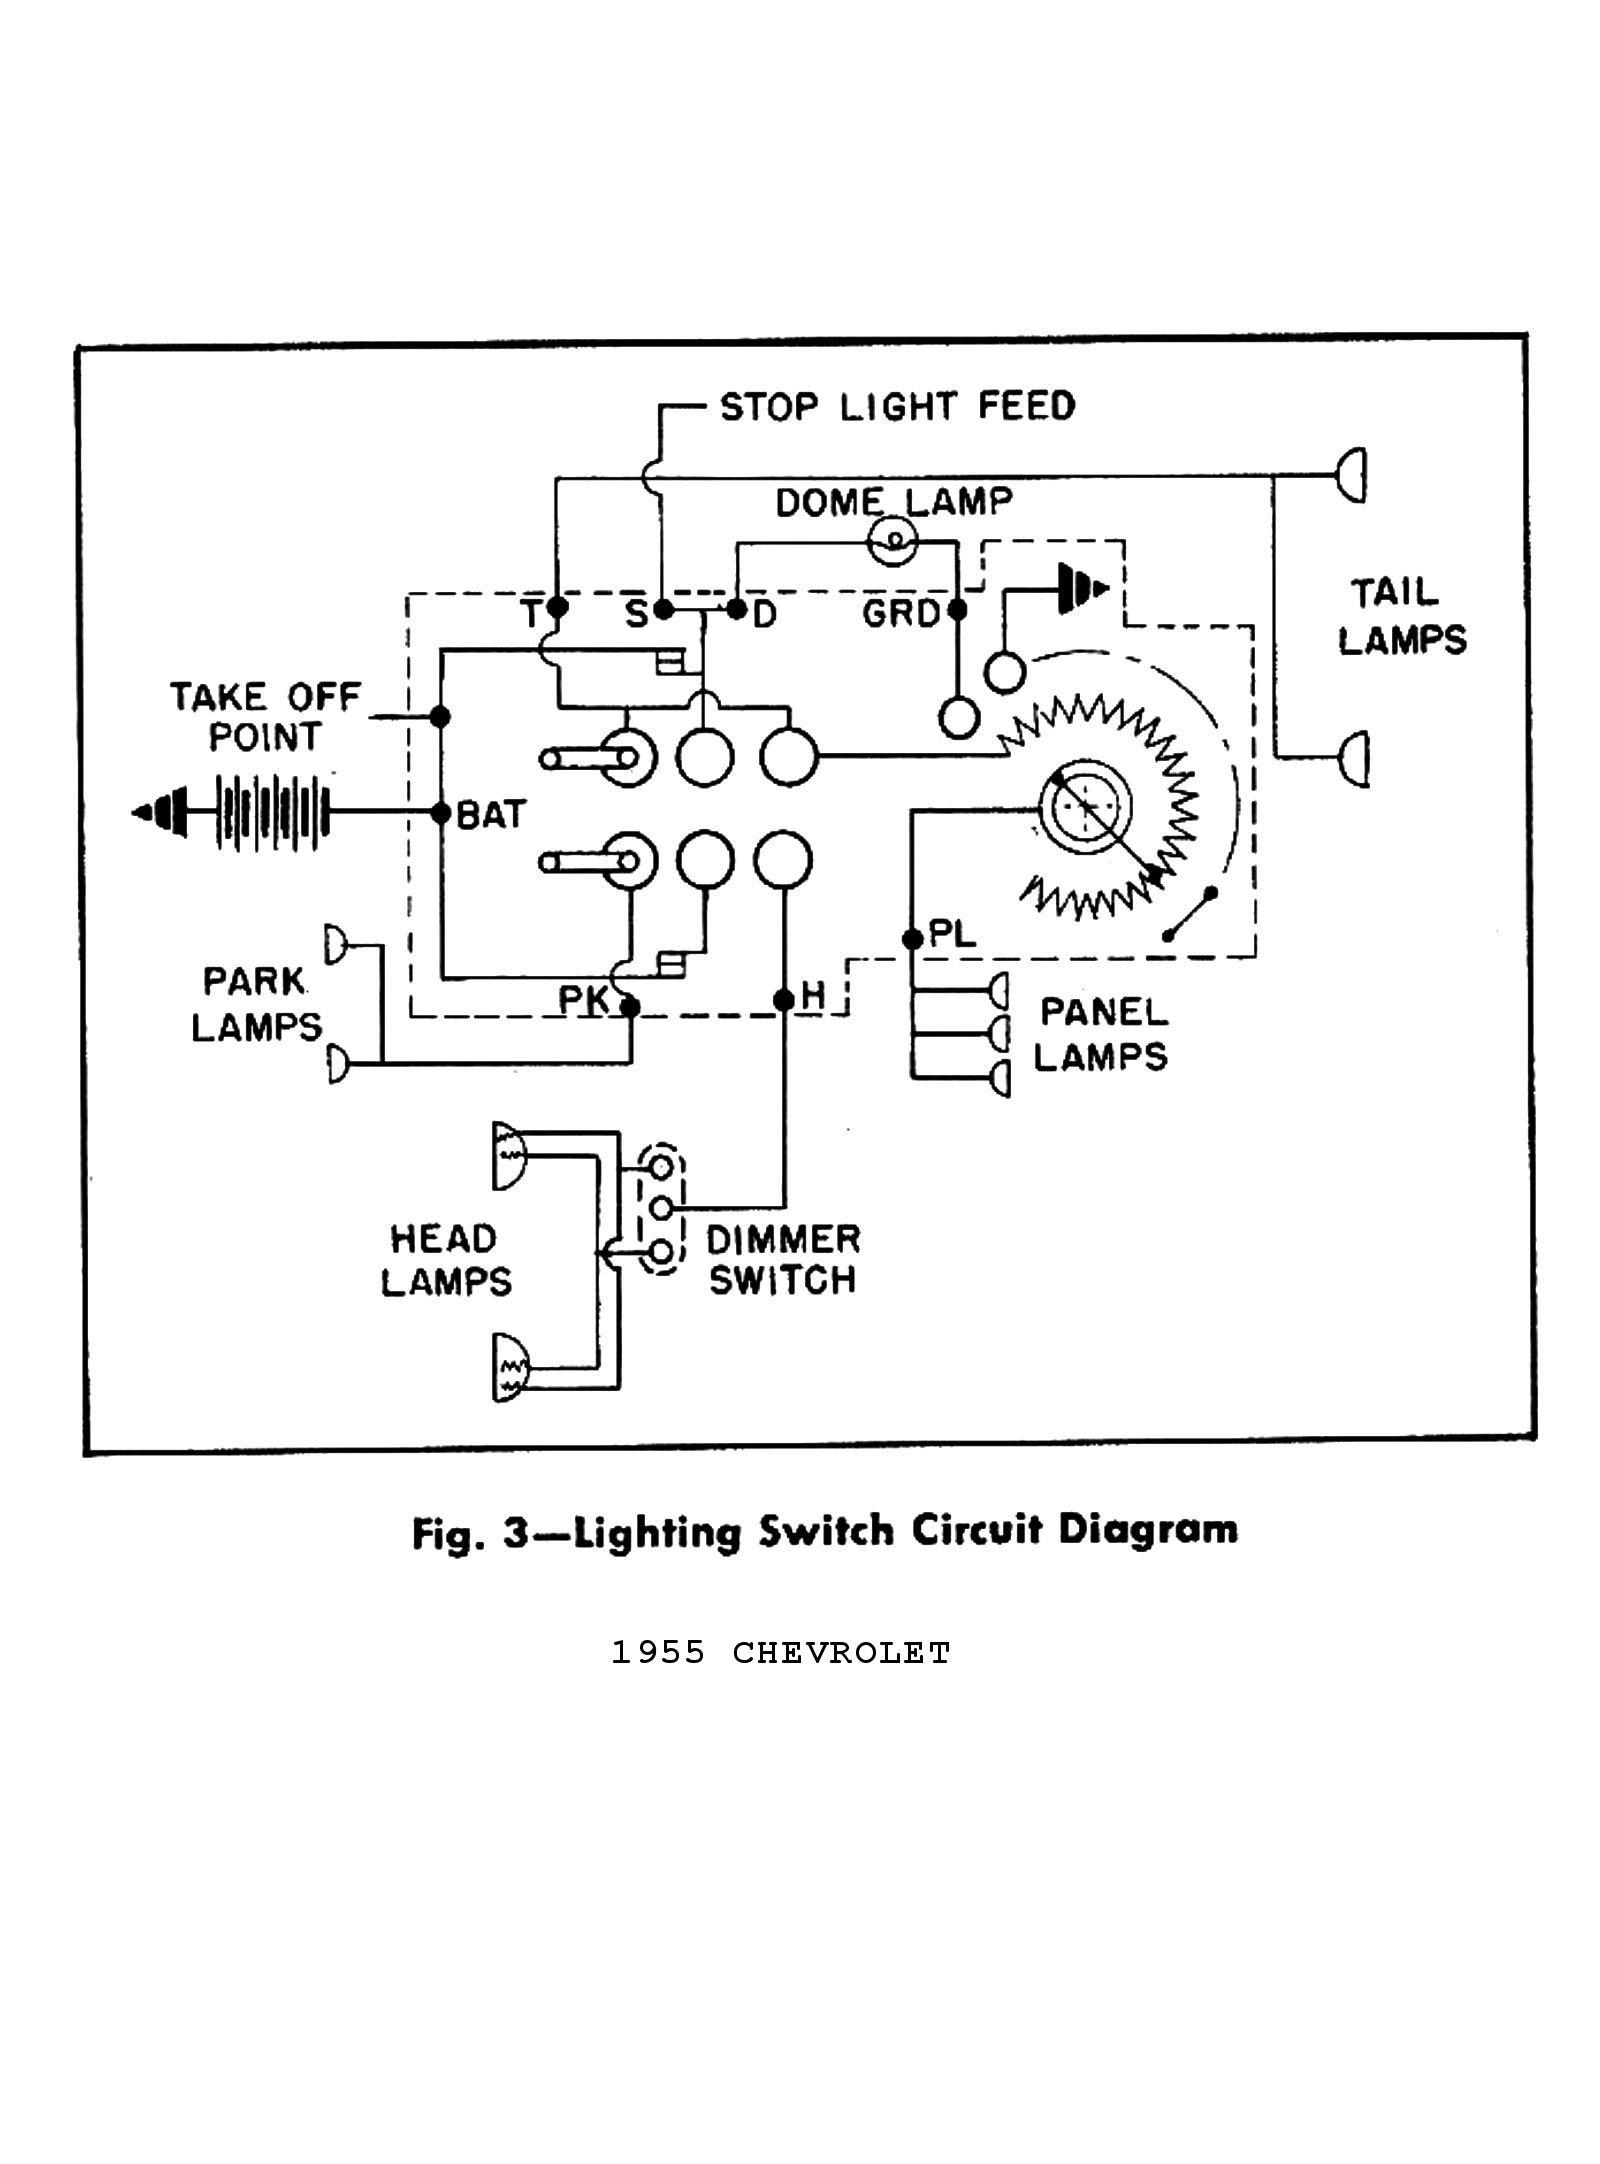 Chevy Dimmer Switch Wiring Diagram - Wiring Diagram Online - Dimmer Switch Wiring Diagram